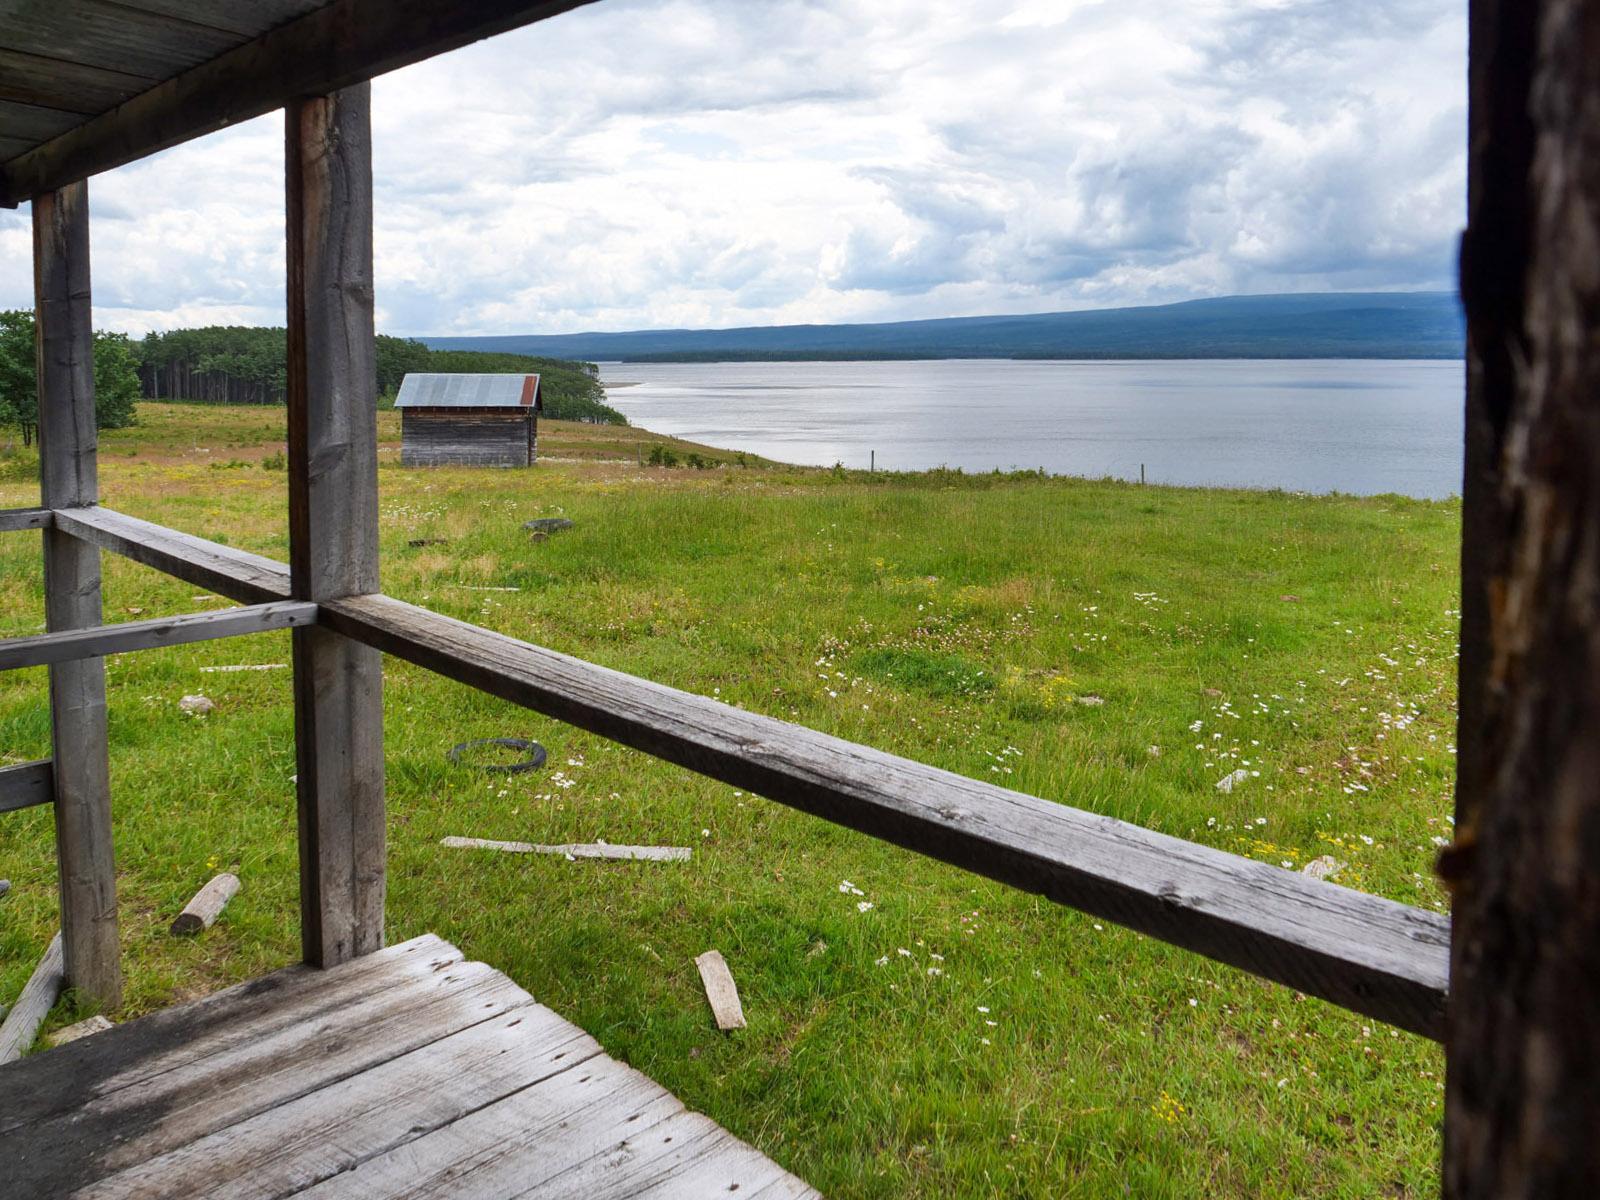 Wistaria farmland ootsa lake 13